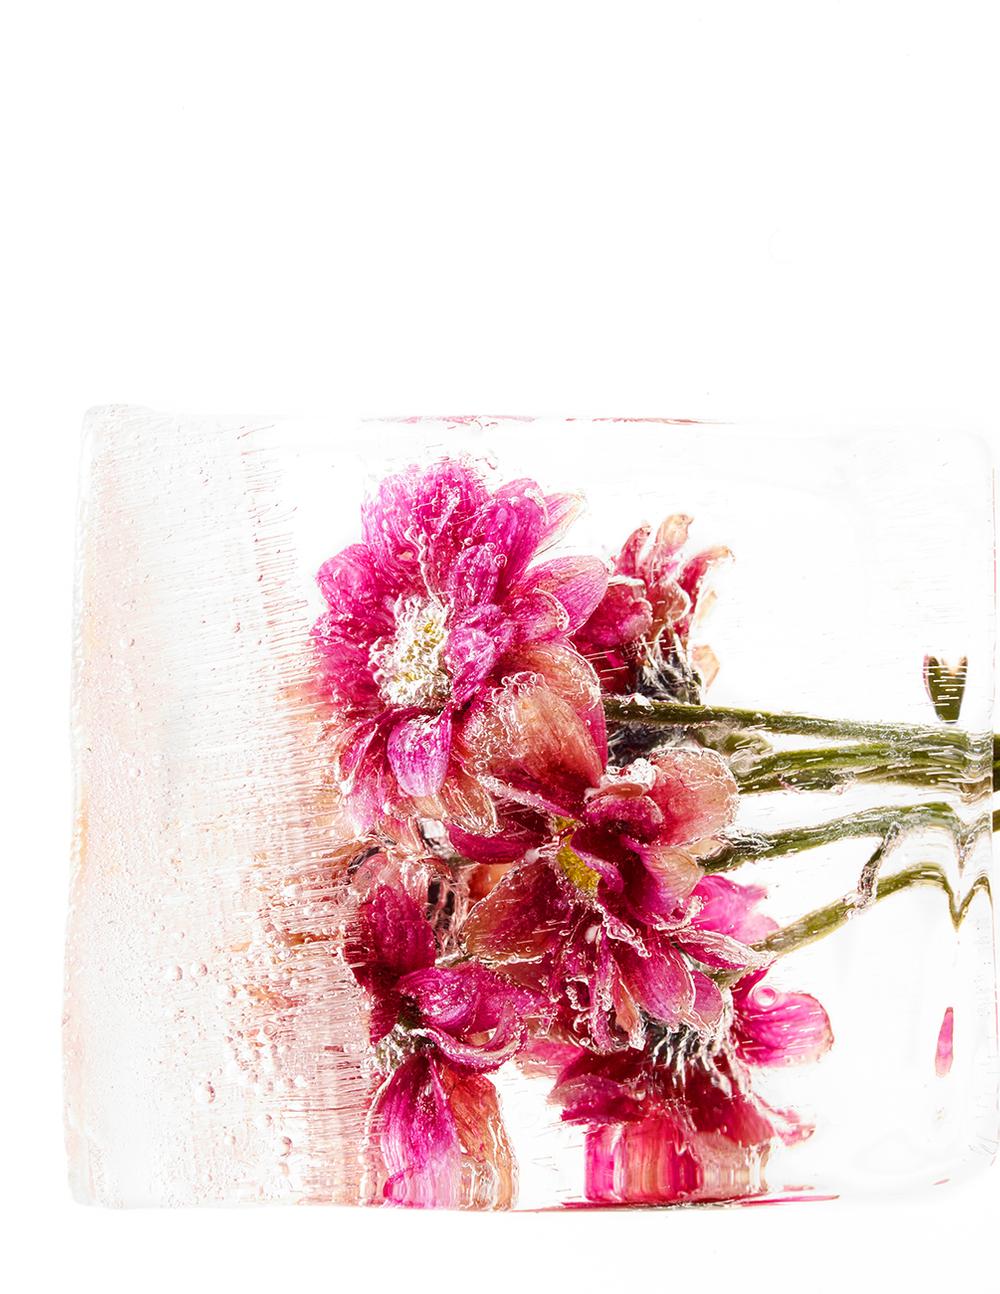 Flowers_test 49604.jpg